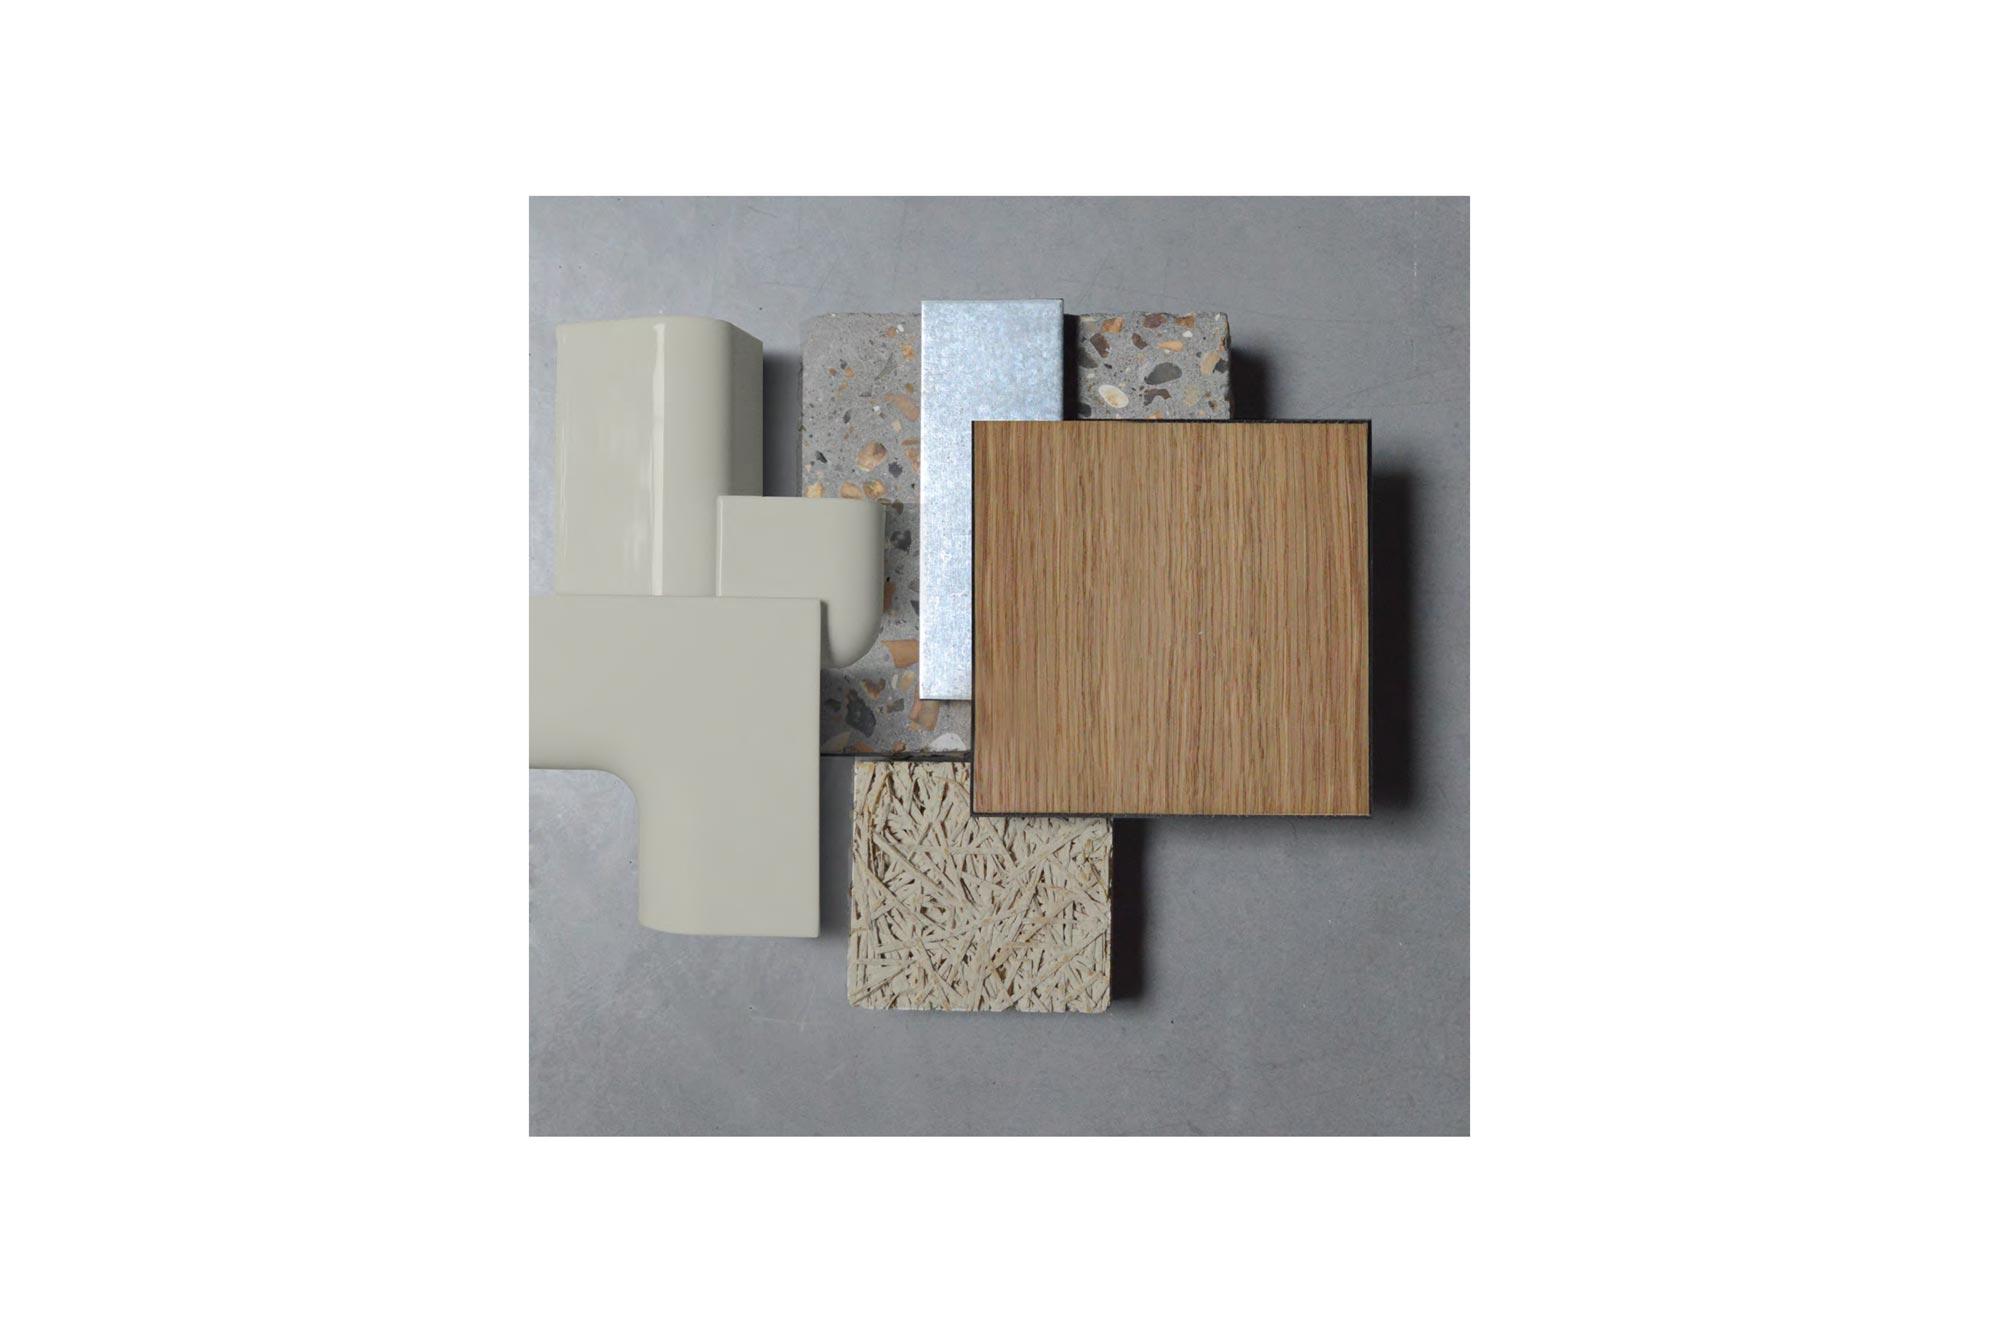 cube-haus-faye-toogood-architects-cs-2000px-10